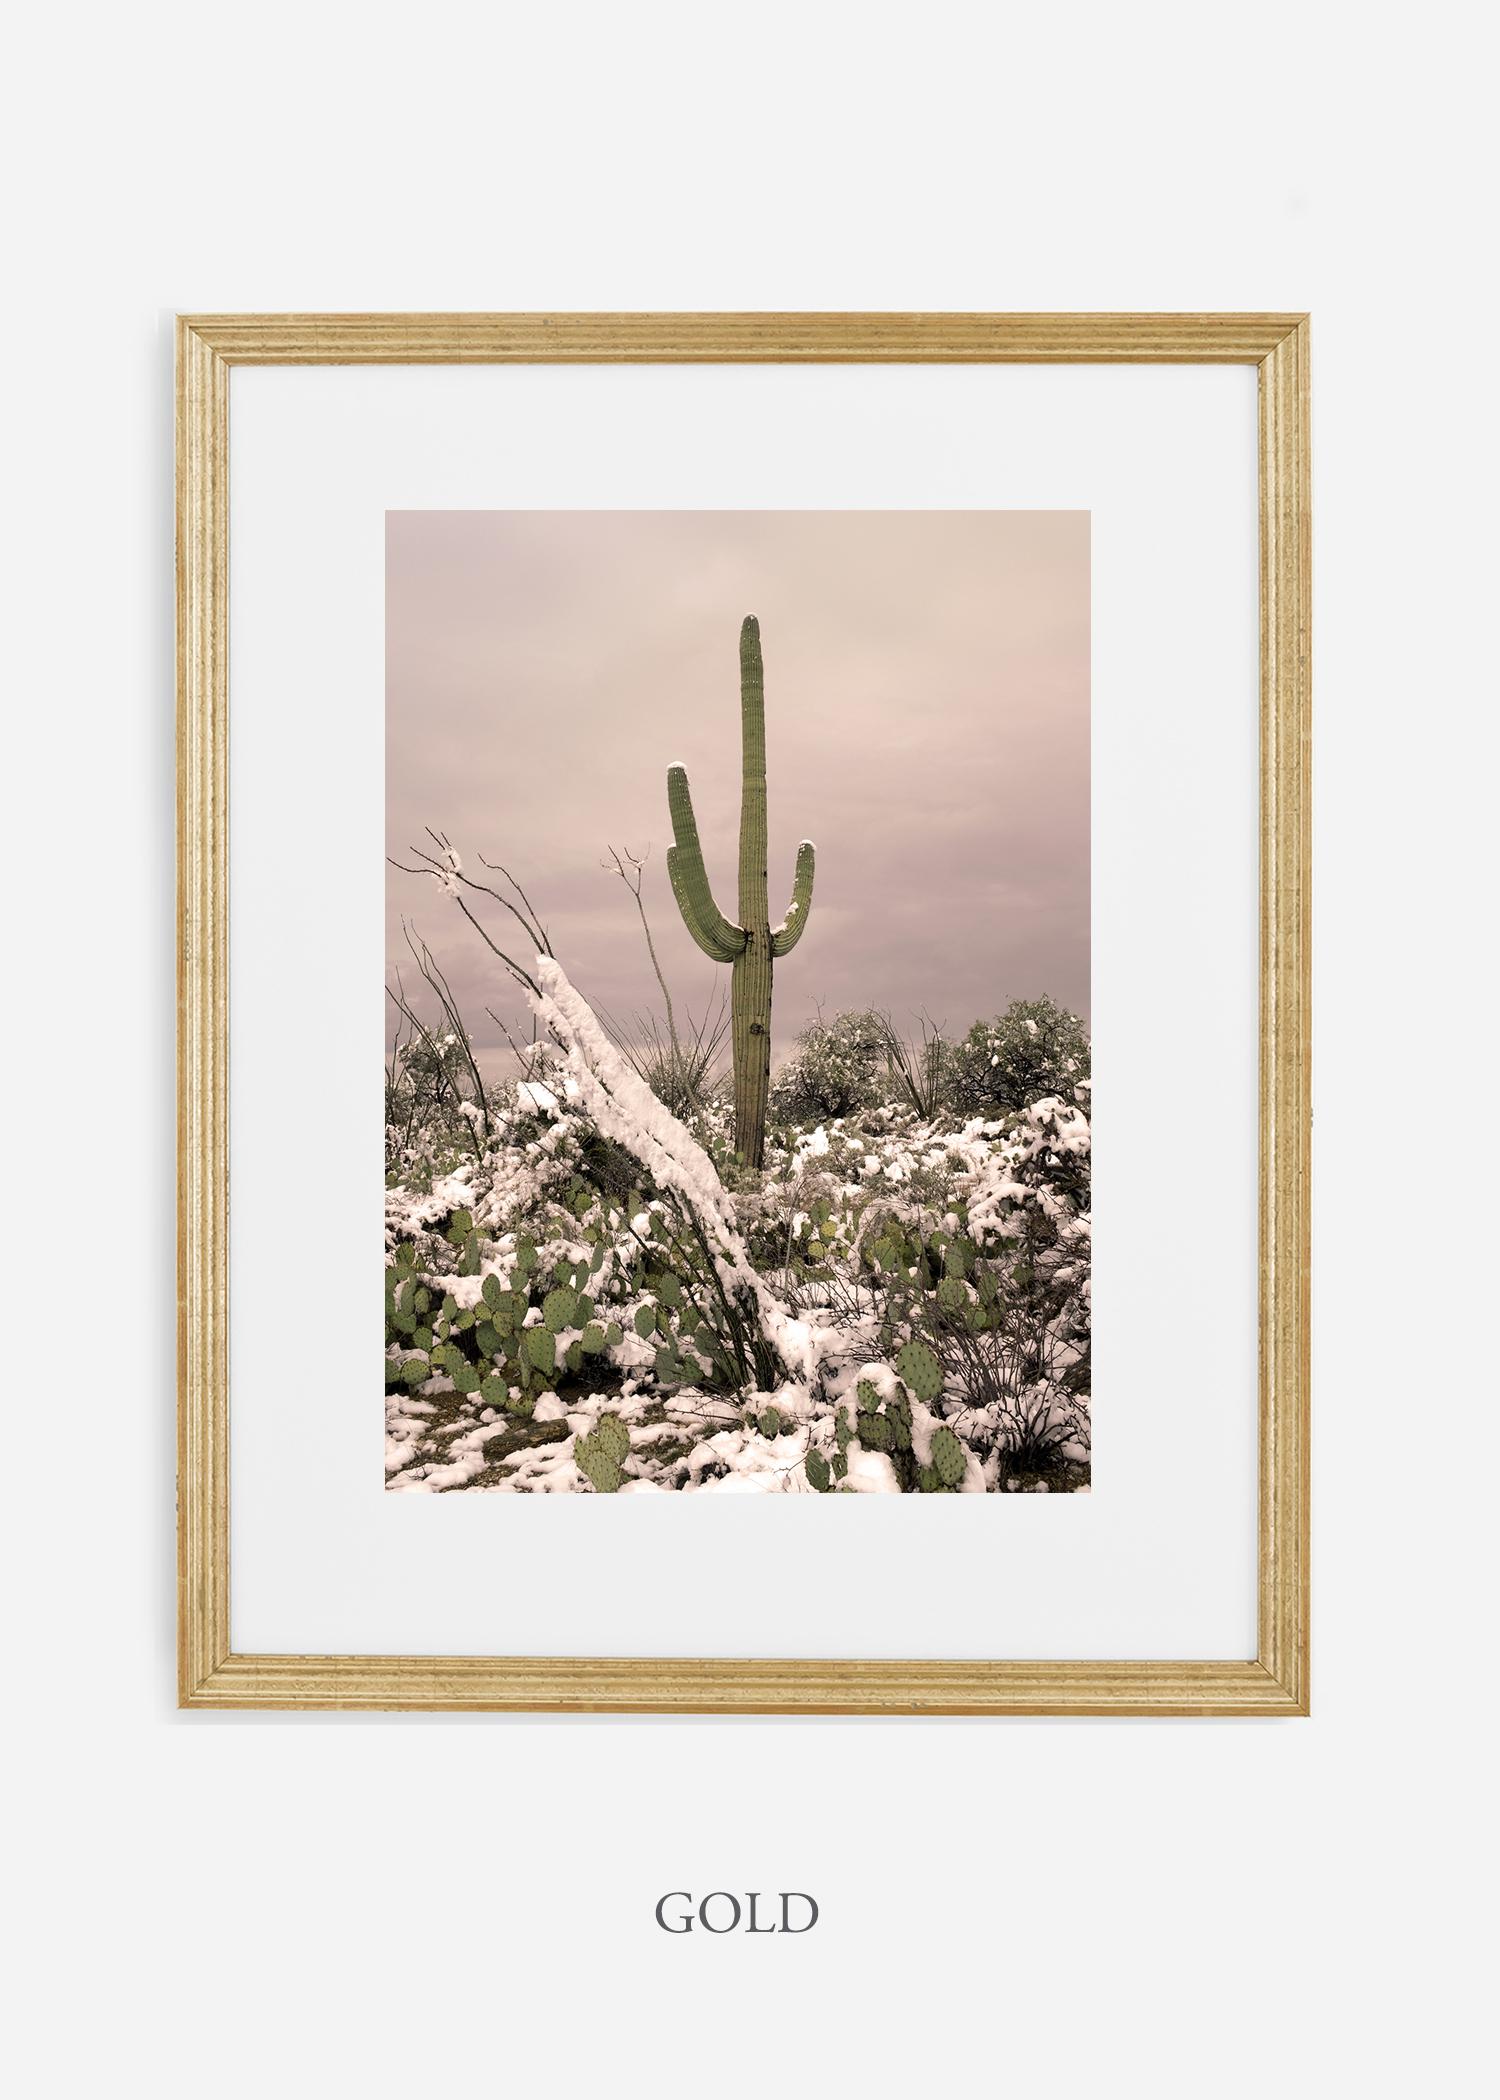 goldframe-saguaroNo.4-wildercalifornia-art-wallart-cactusprint-homedecor-prints-arizona-botanical-artwork-interiordesign.jpg